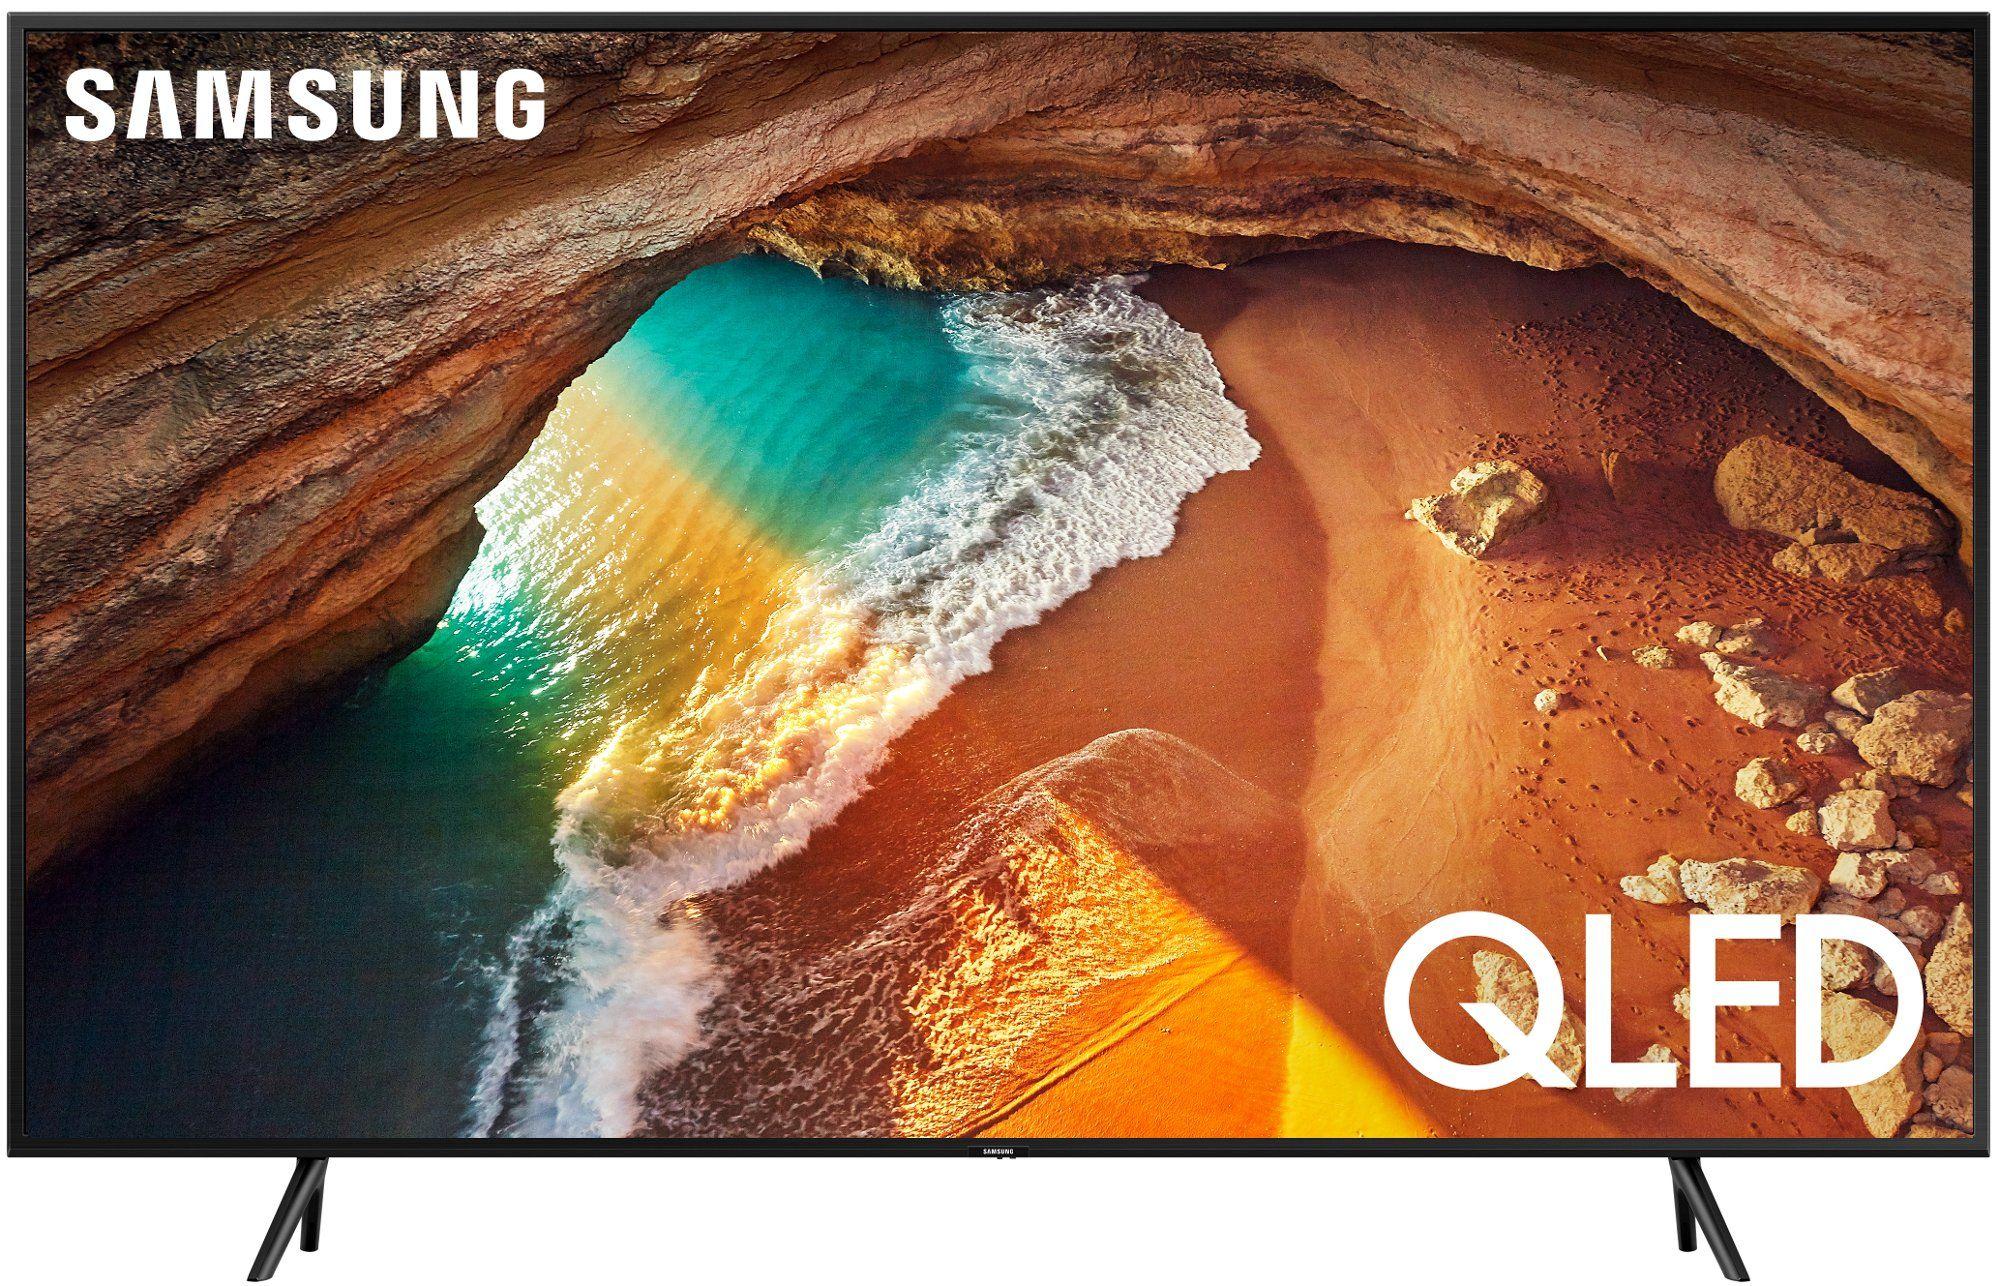 Samsung 75 Inch Qled 4k Uhd Q60 Series Smart Tv Samsung Smart Tv